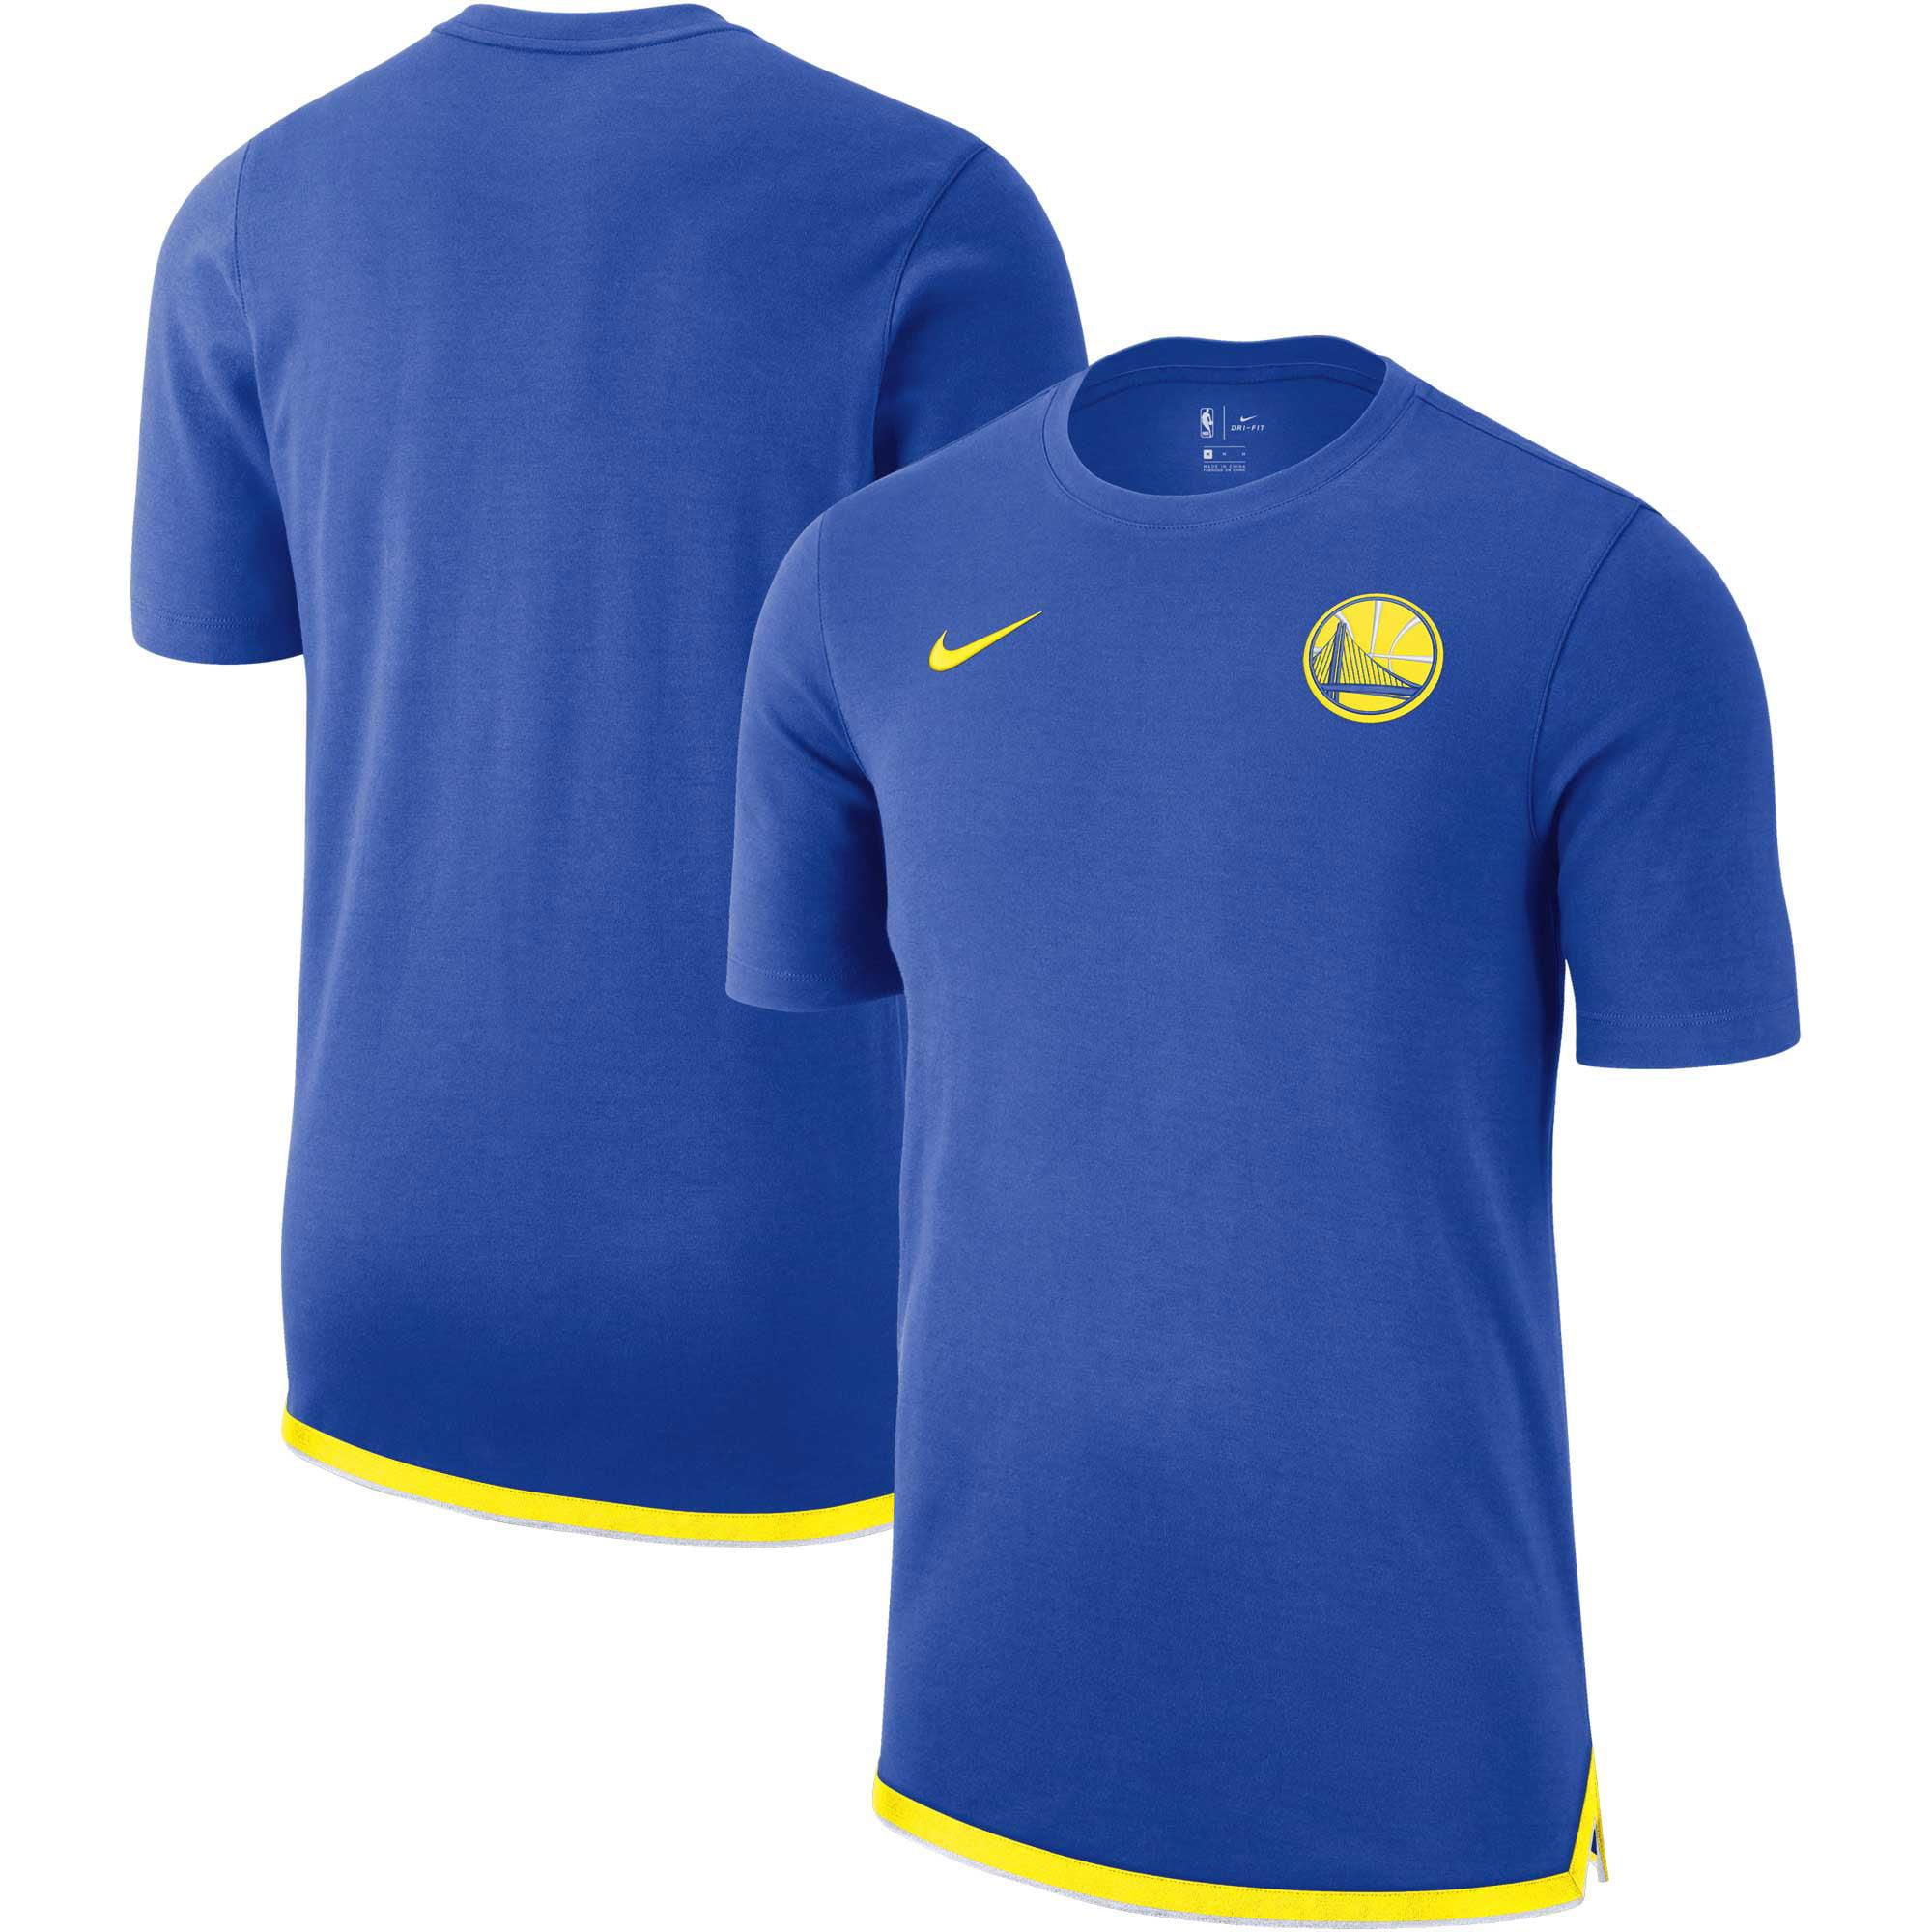 Golden State Warriors Nike Essential Uniform DNA T-Shirt - Royal